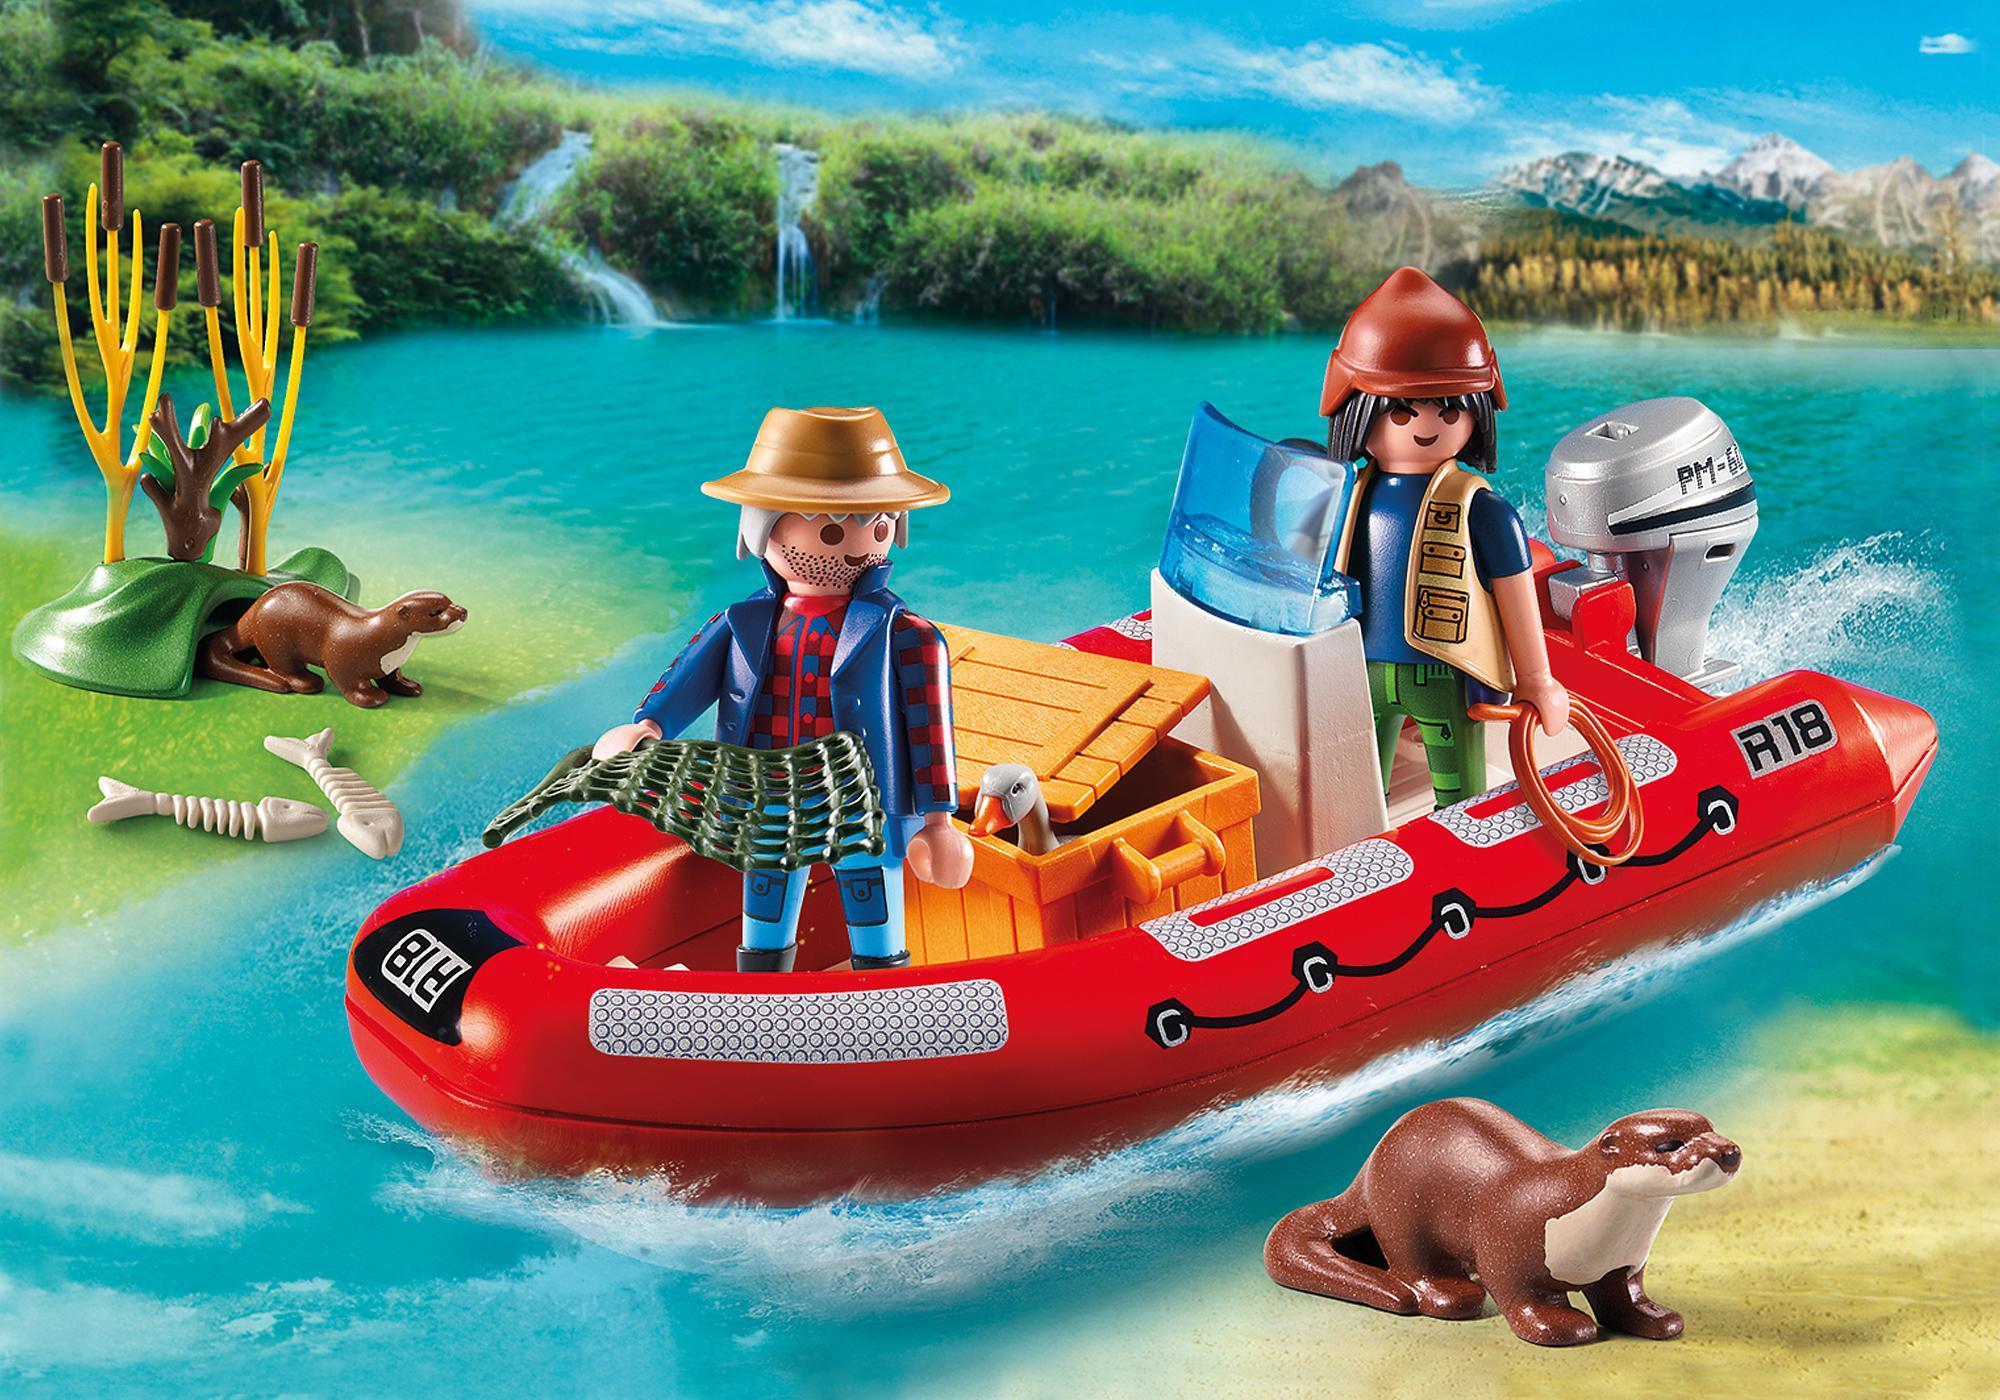 http://media.playmobil.com/i/playmobil/5559_product_detail/Gommone-avventura con esploratori